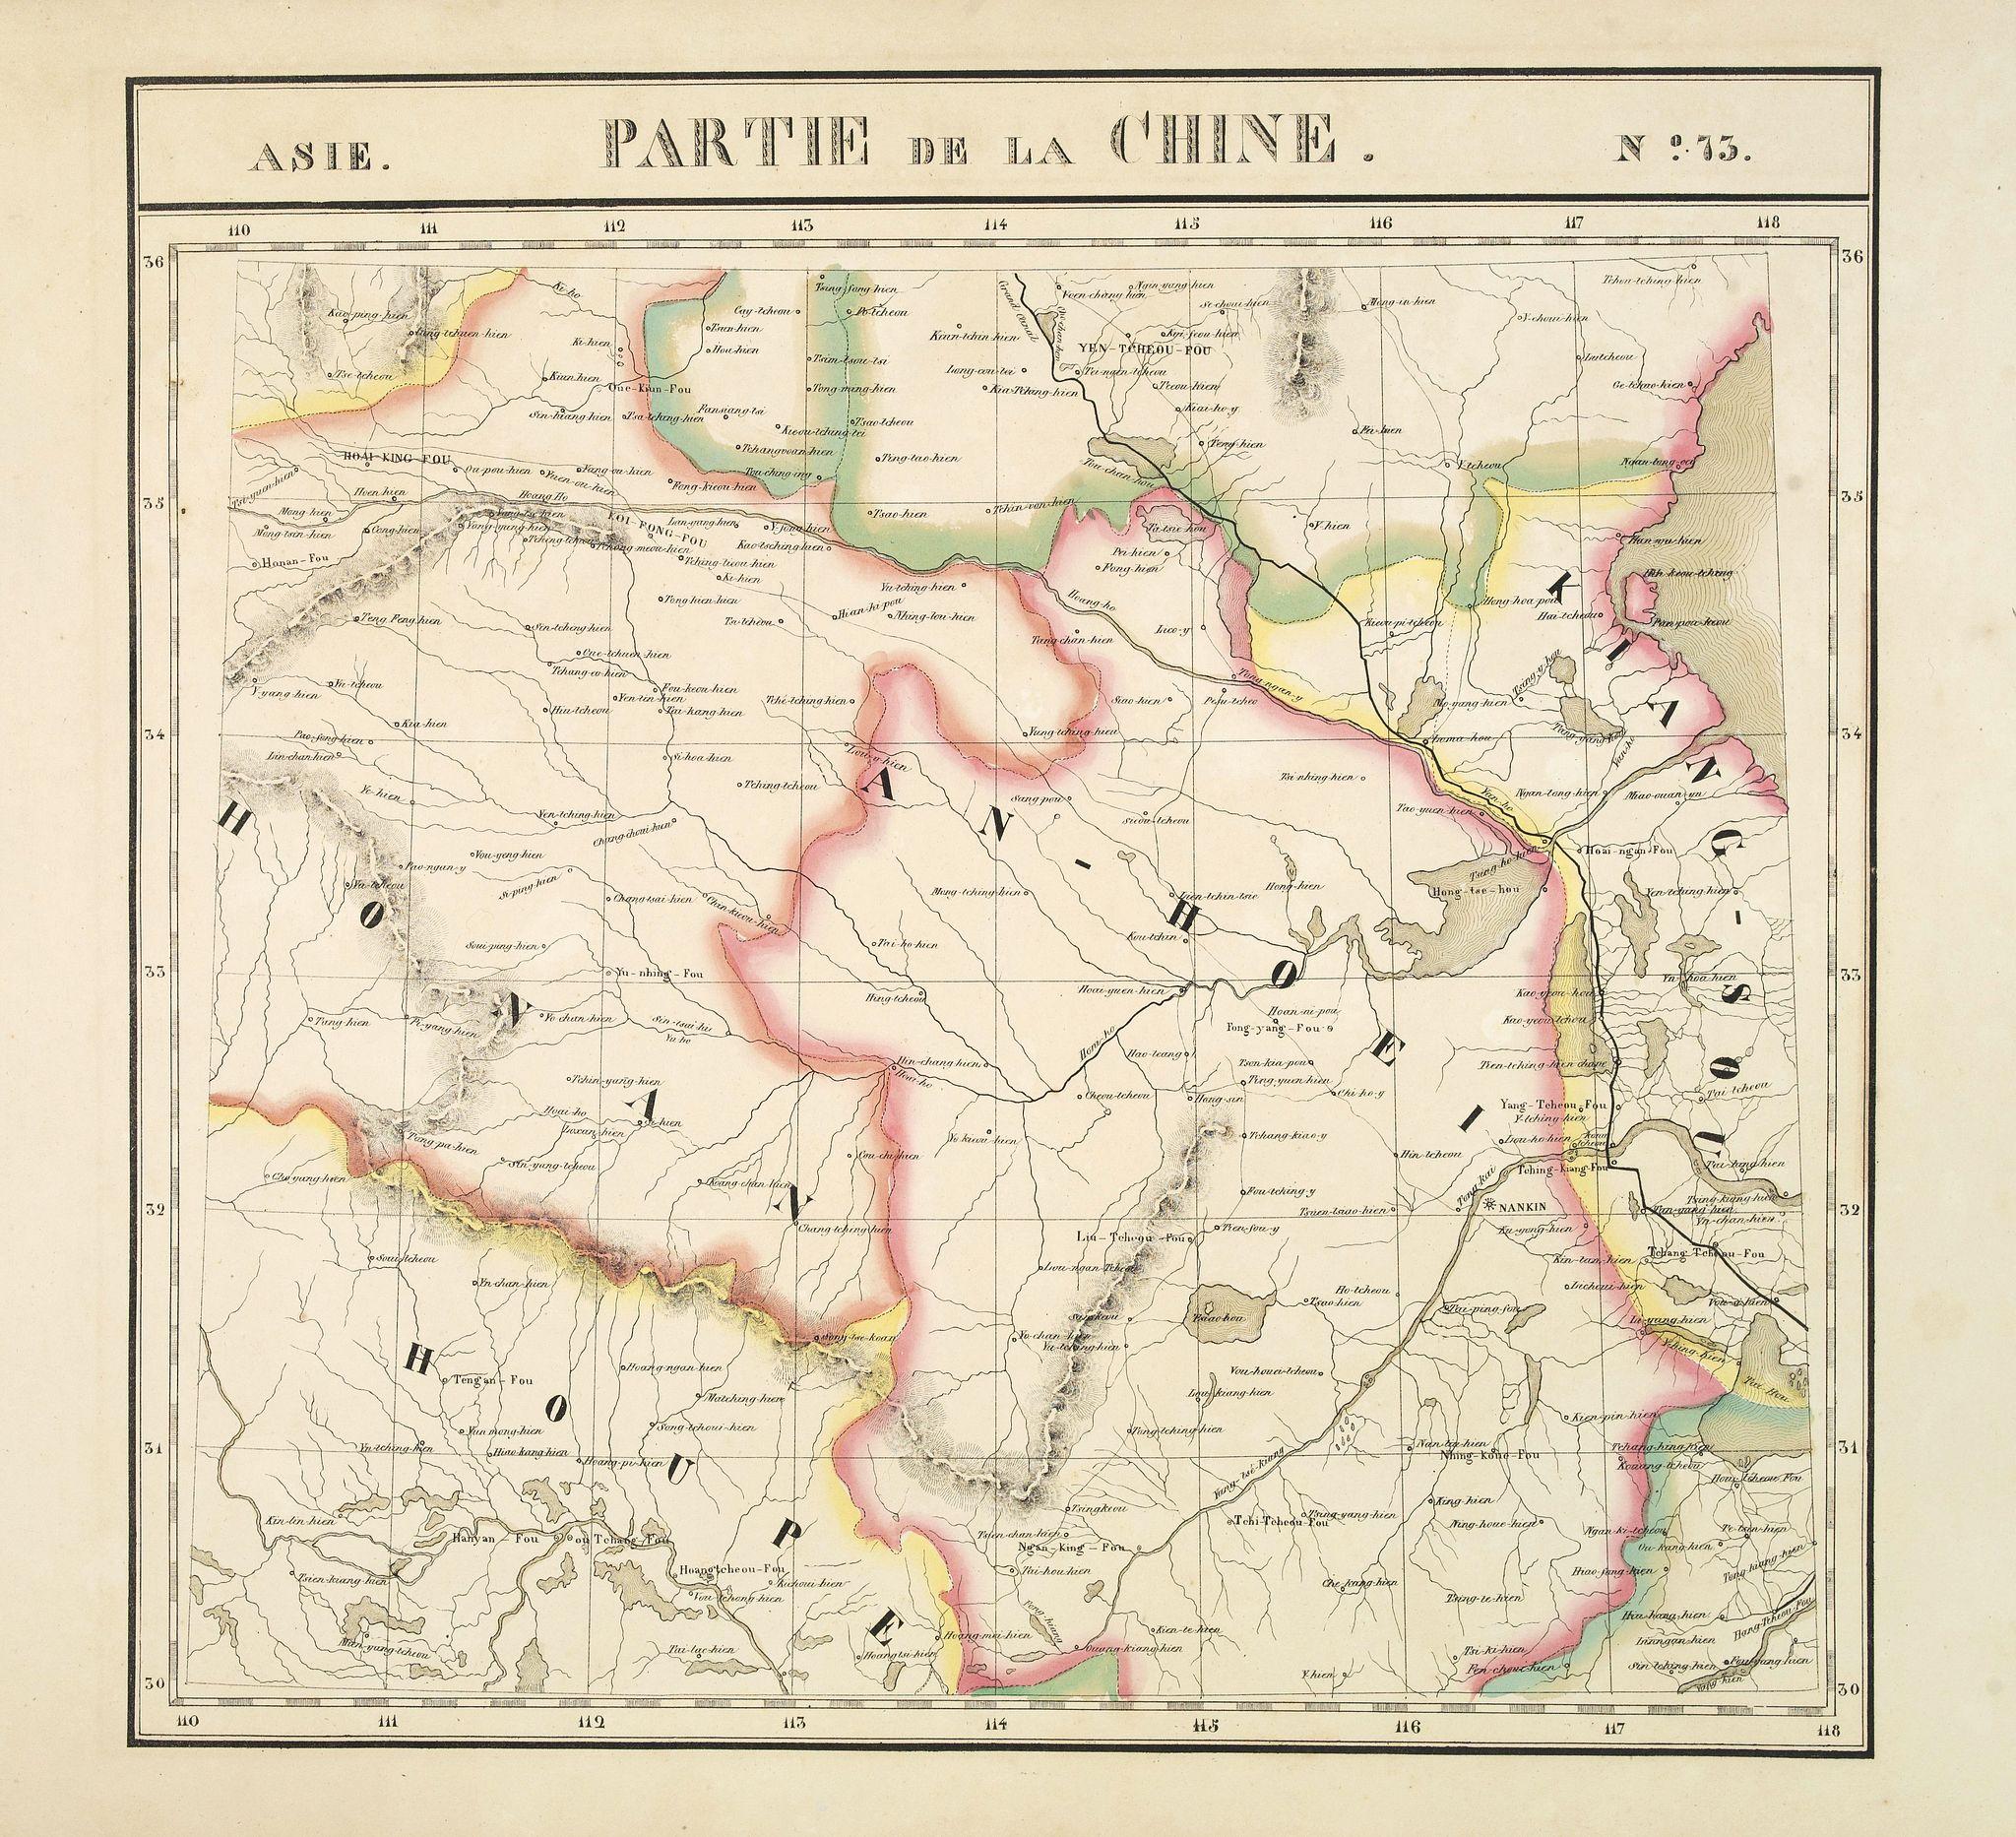 VANDERMAELEN, Ph. - Partie de la Chine N°73. (Covers parts of Hubei, Henan, Anhui, Jiangsu, Shanxi and Shandong provinces.)